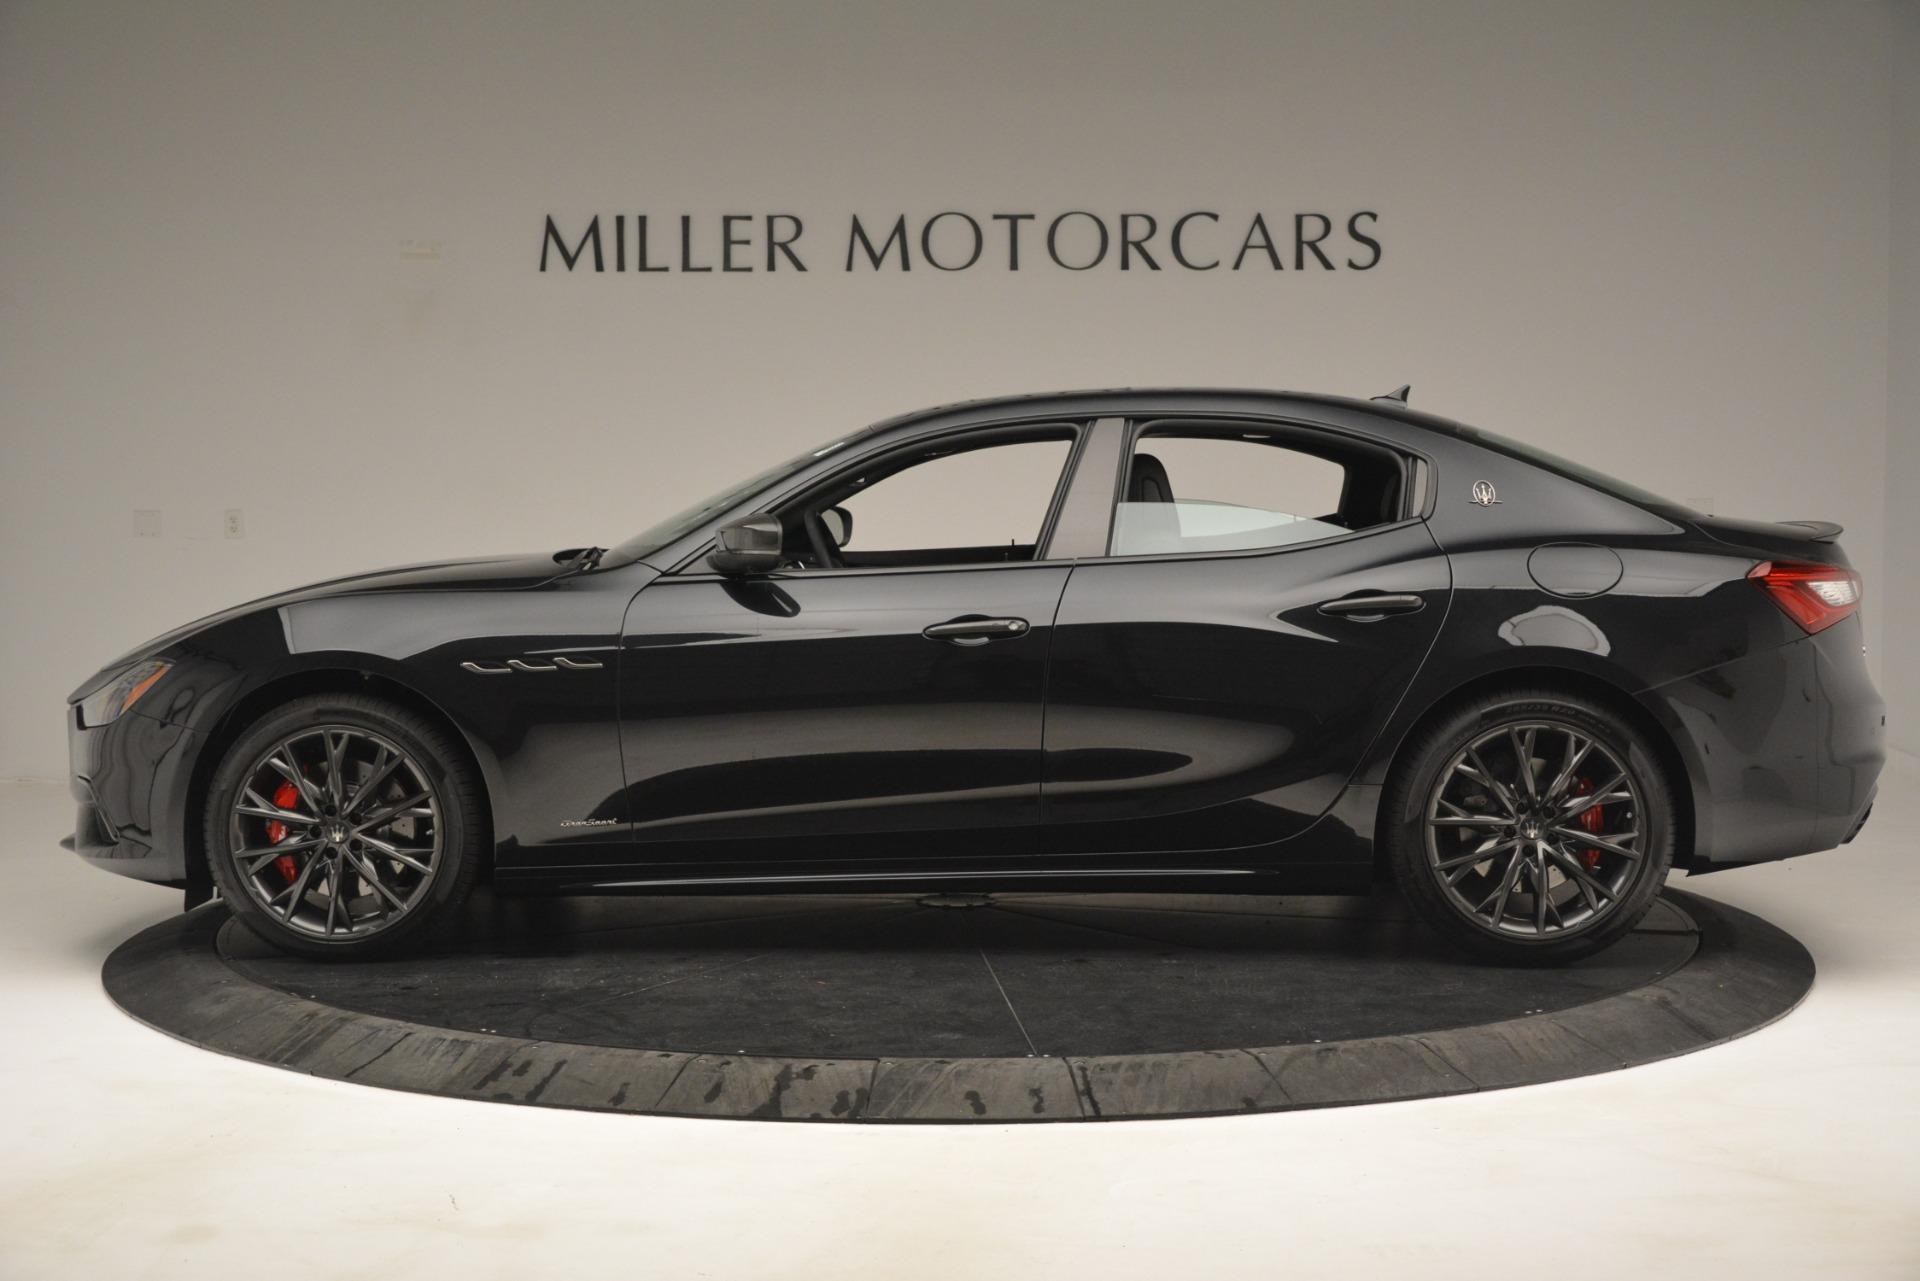 New 2019 Maserati Ghibli S Q4 GranSport For Sale In Westport, CT 2926_p3